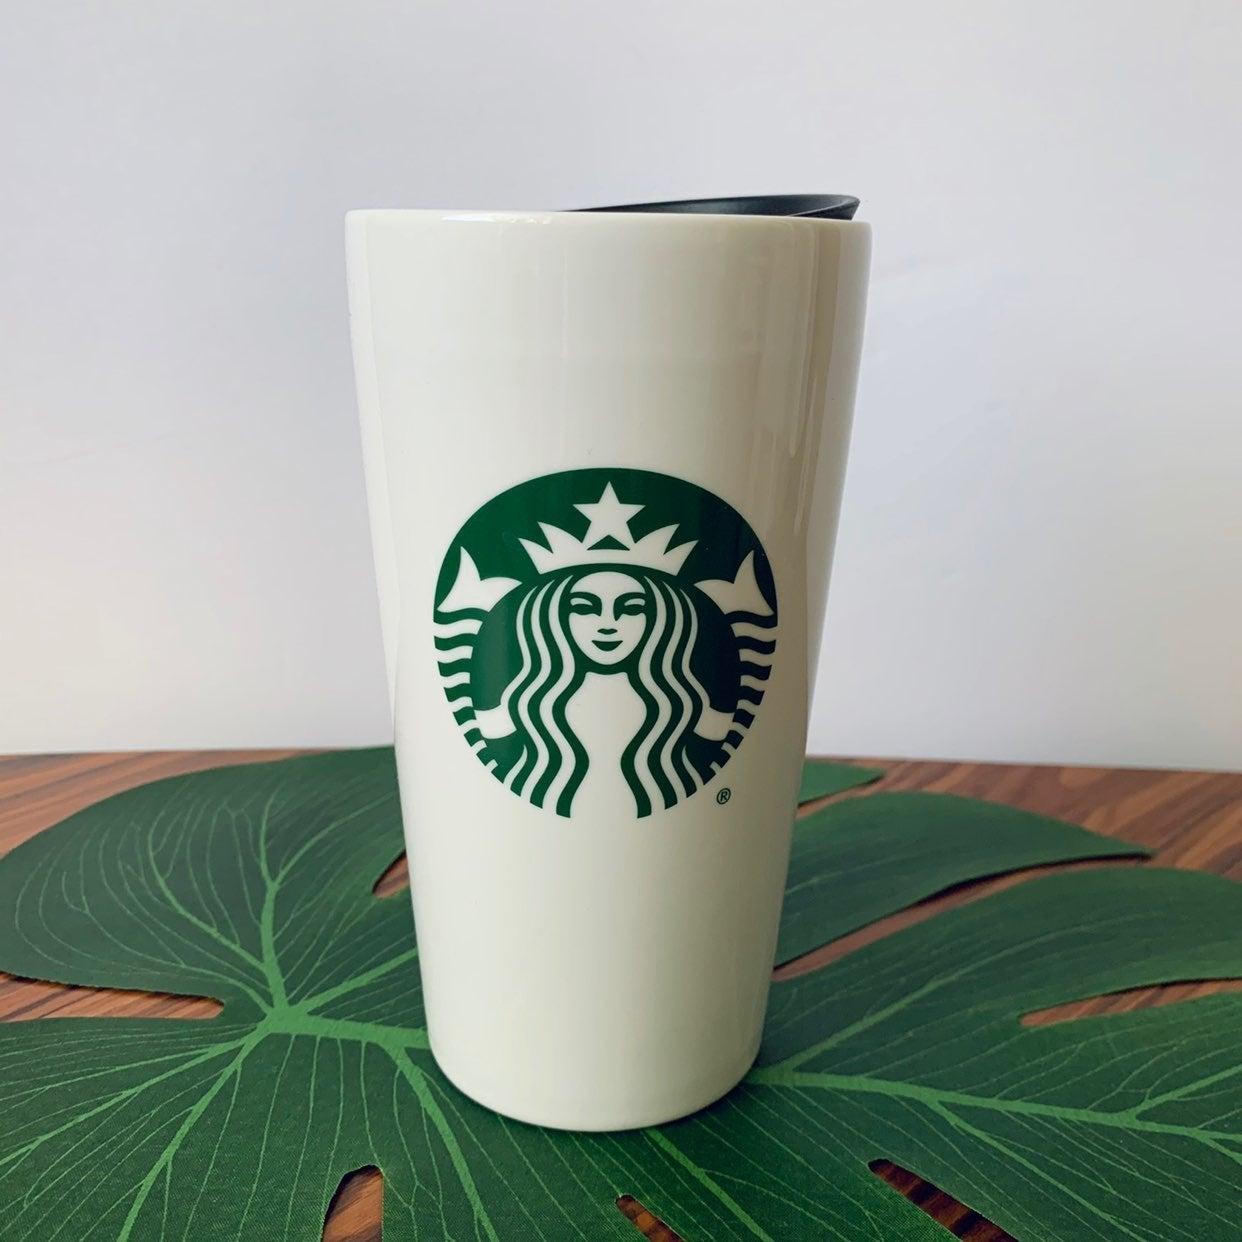 Starbucks Ceramic Tumbler 12oz